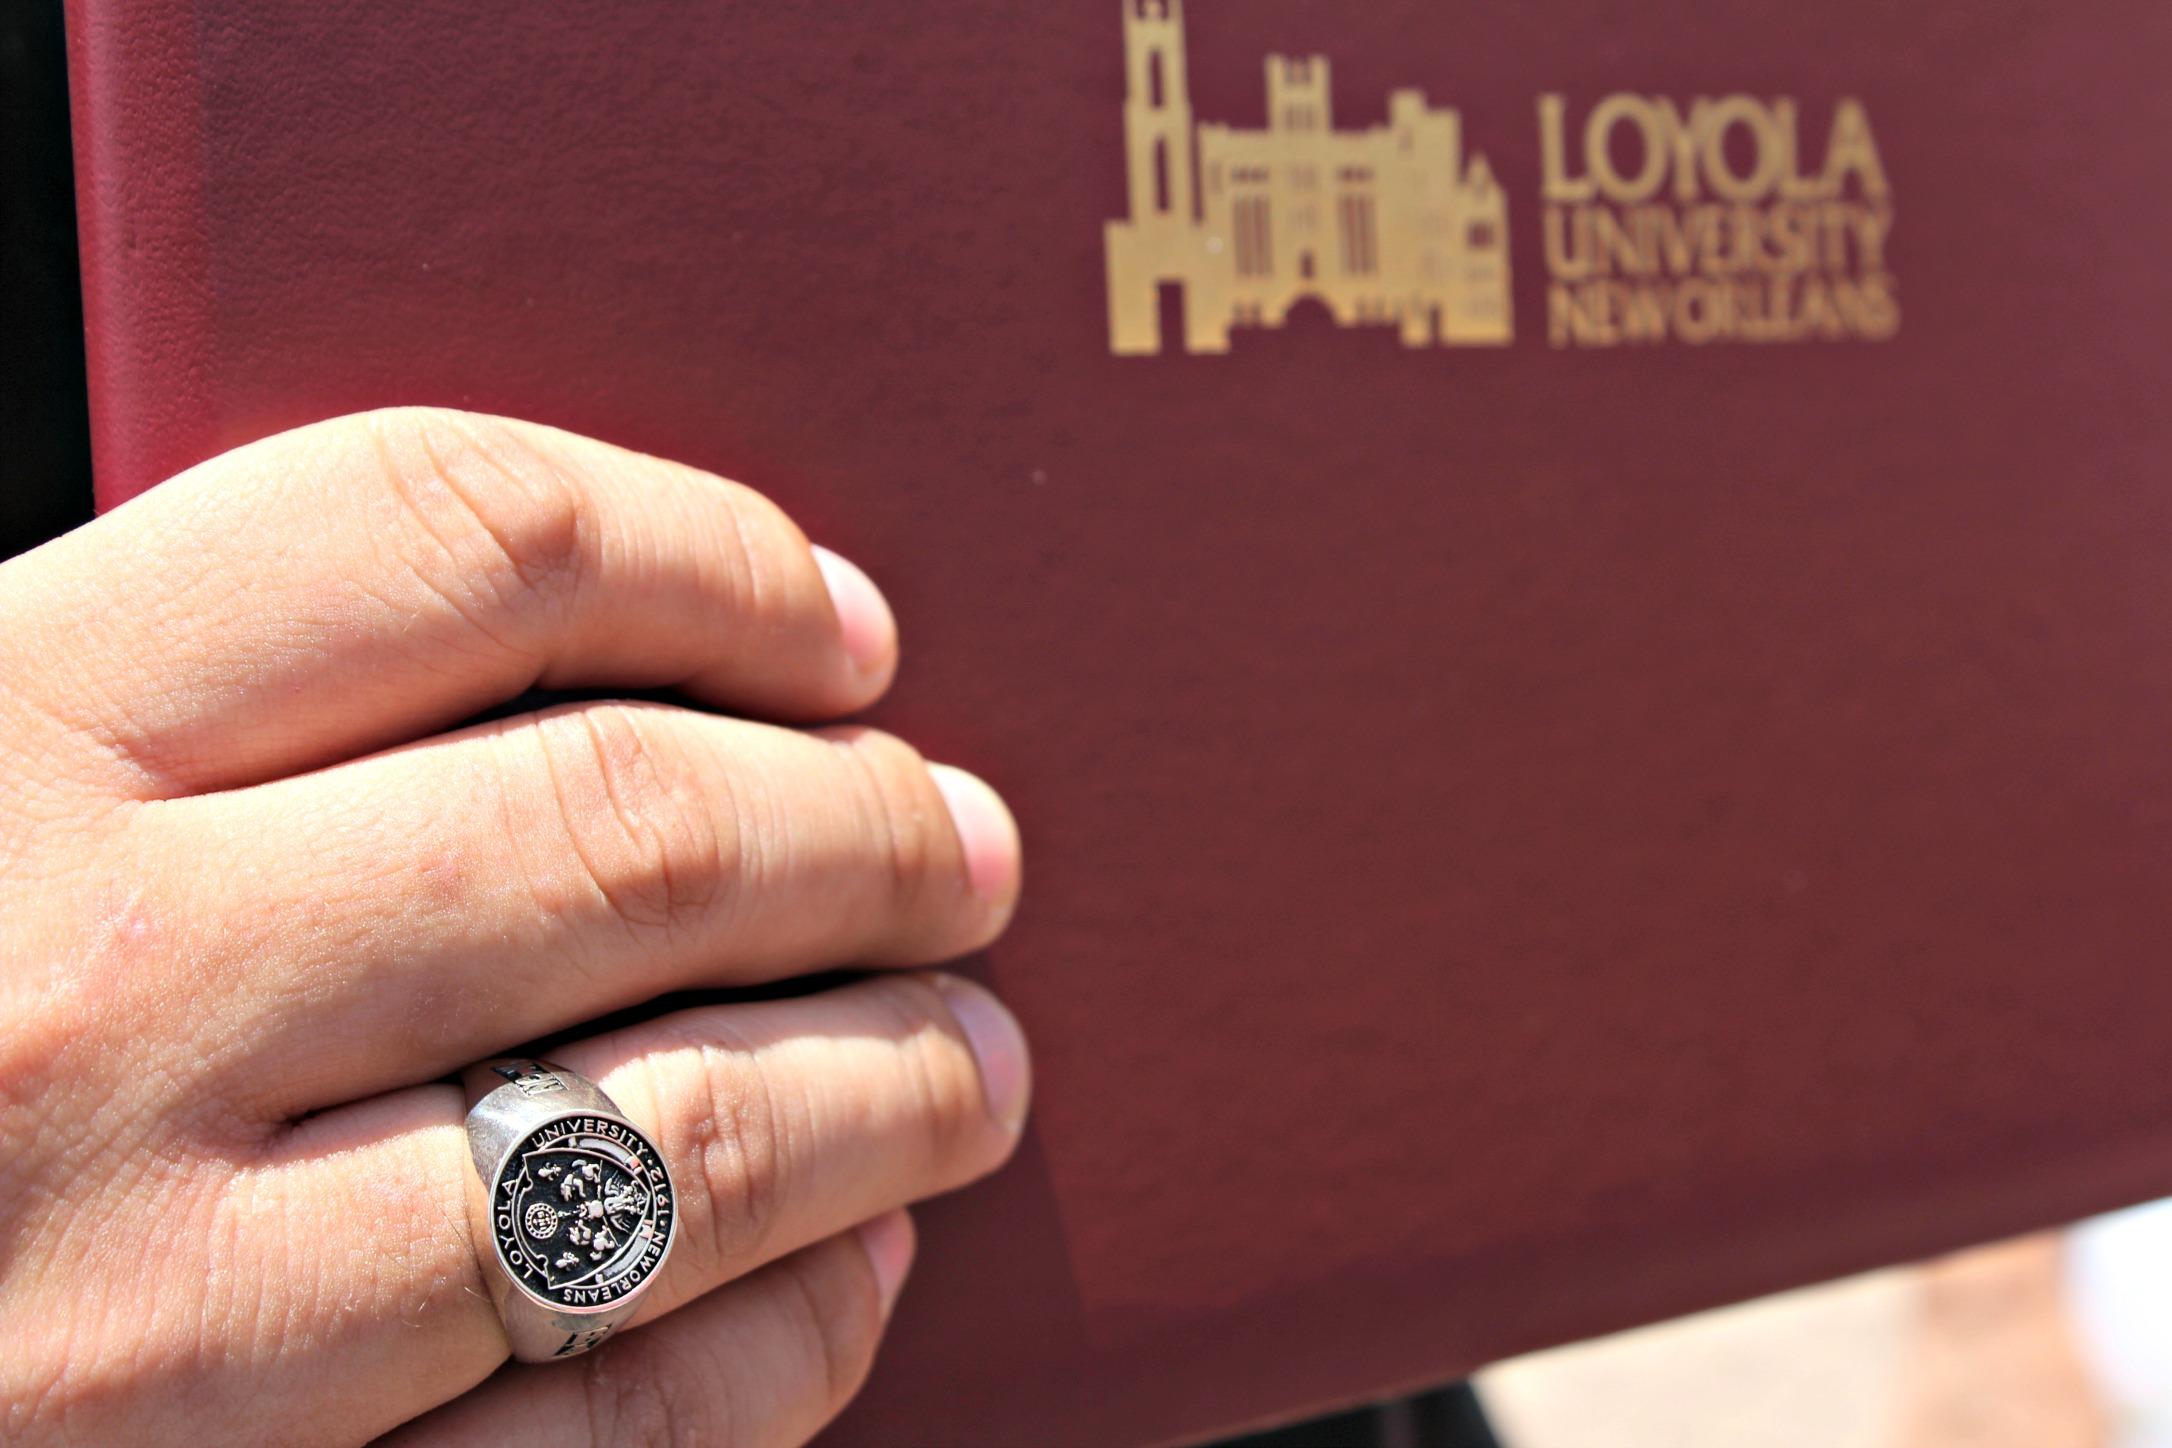 New Orleans Loyola Graduation